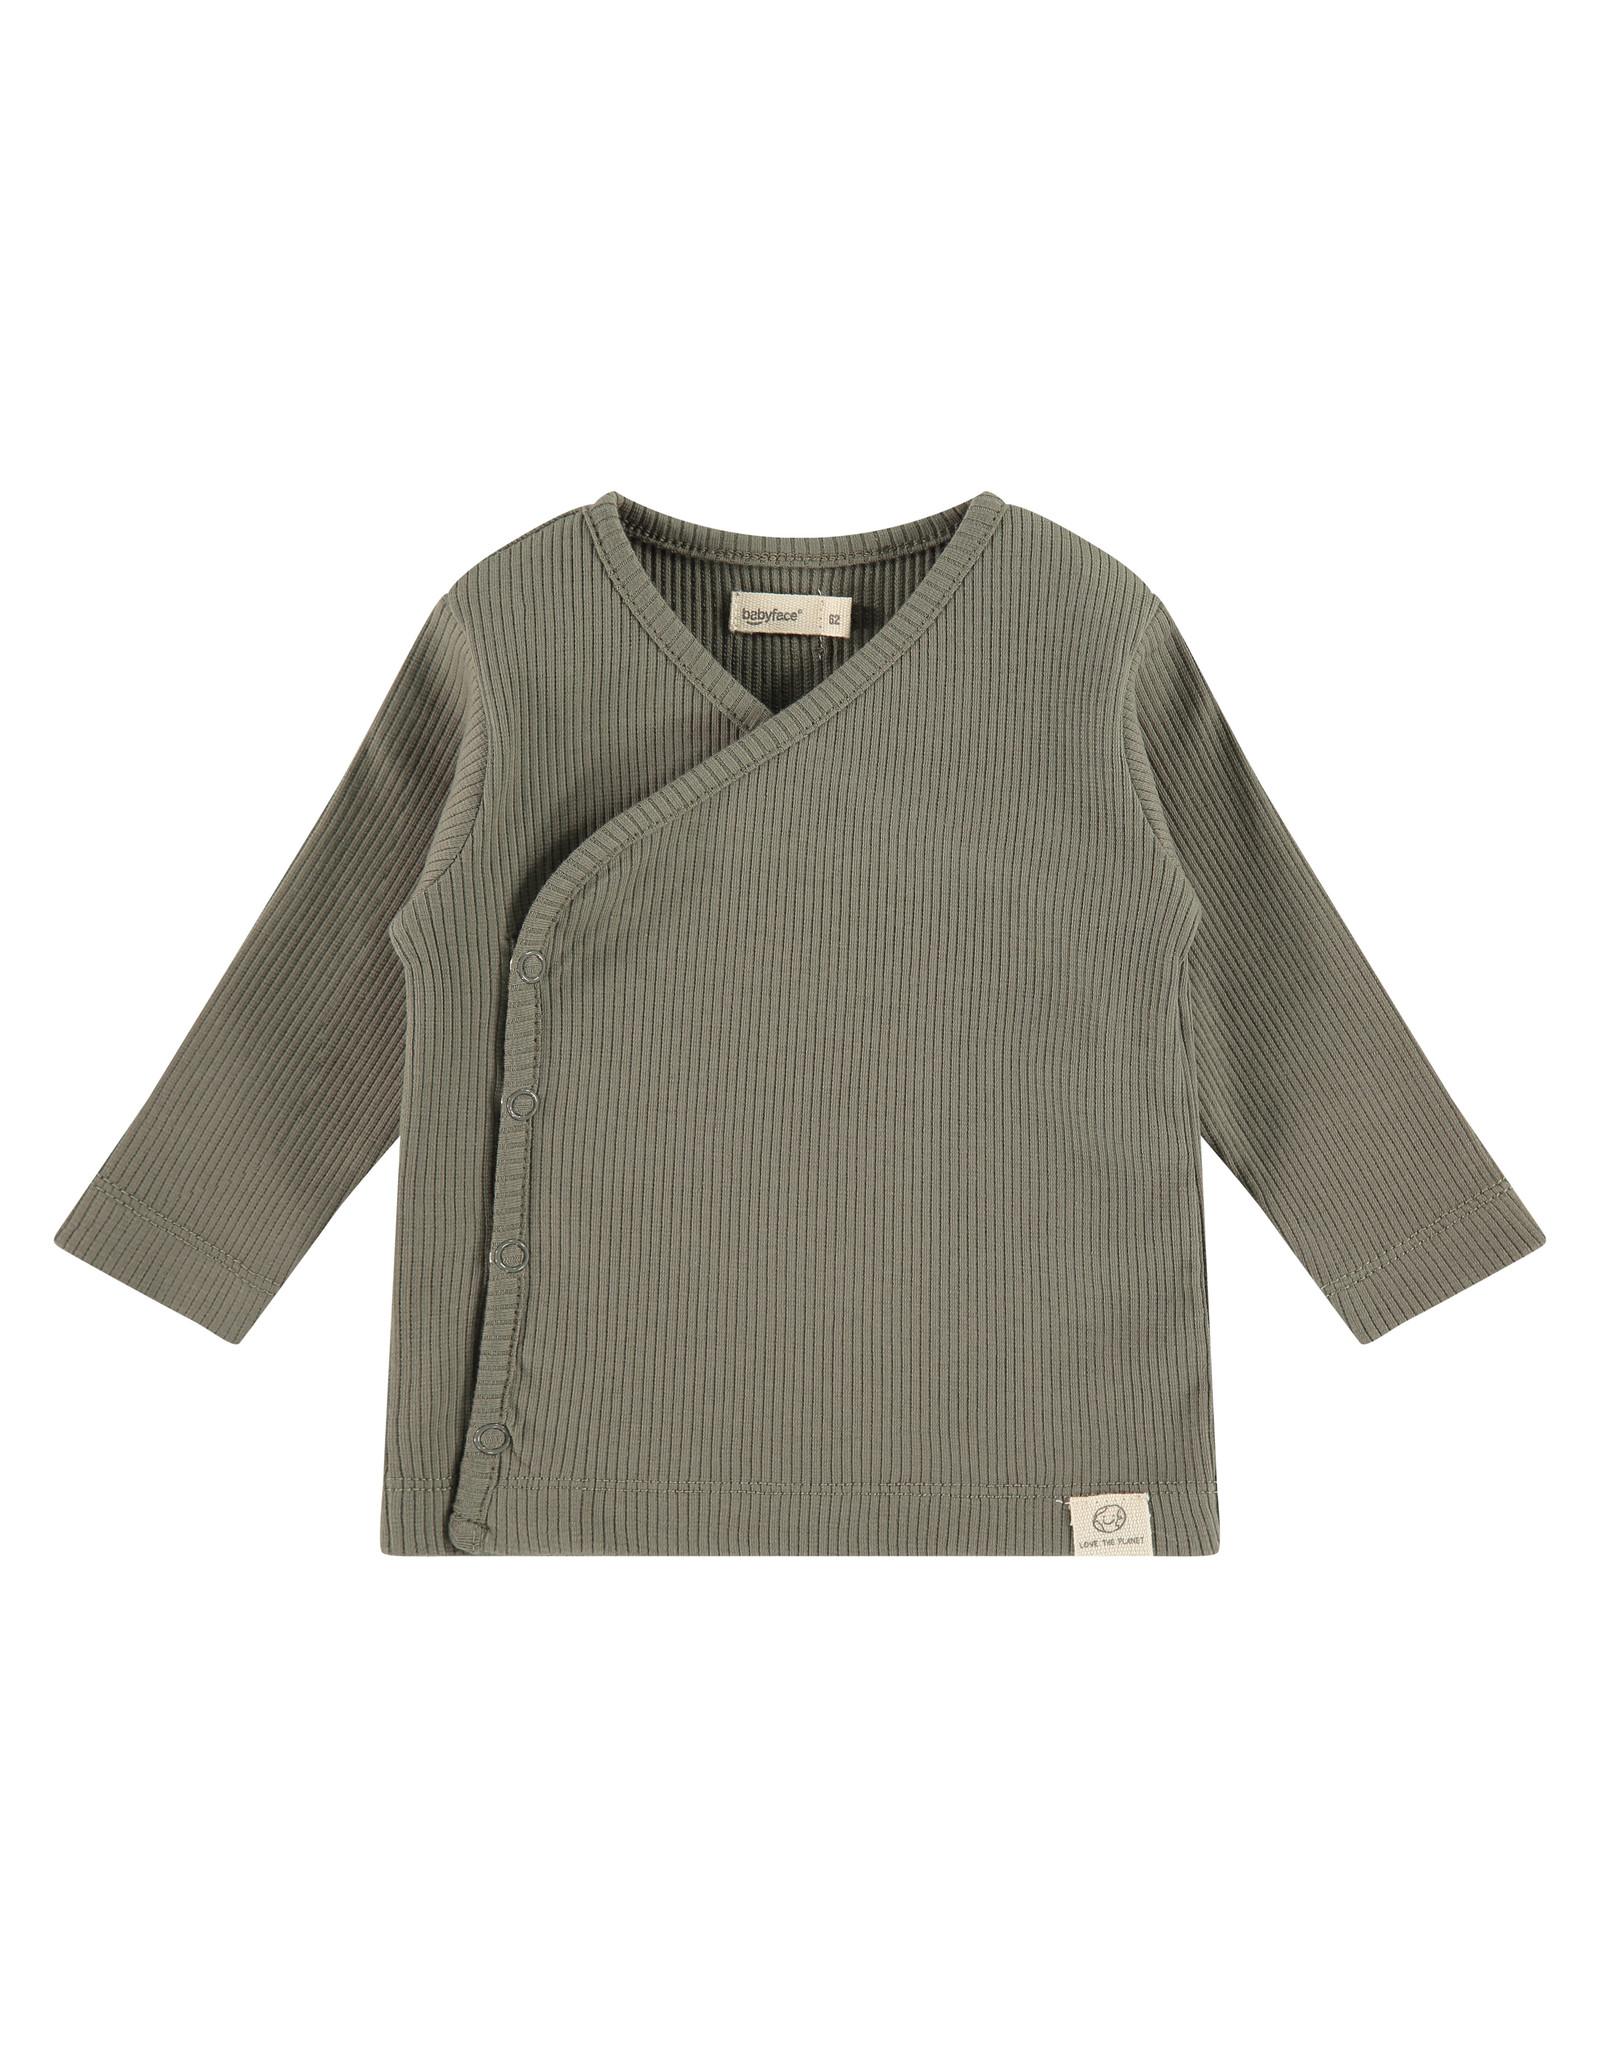 Babyface baby t-shirt long sleeve, olive green